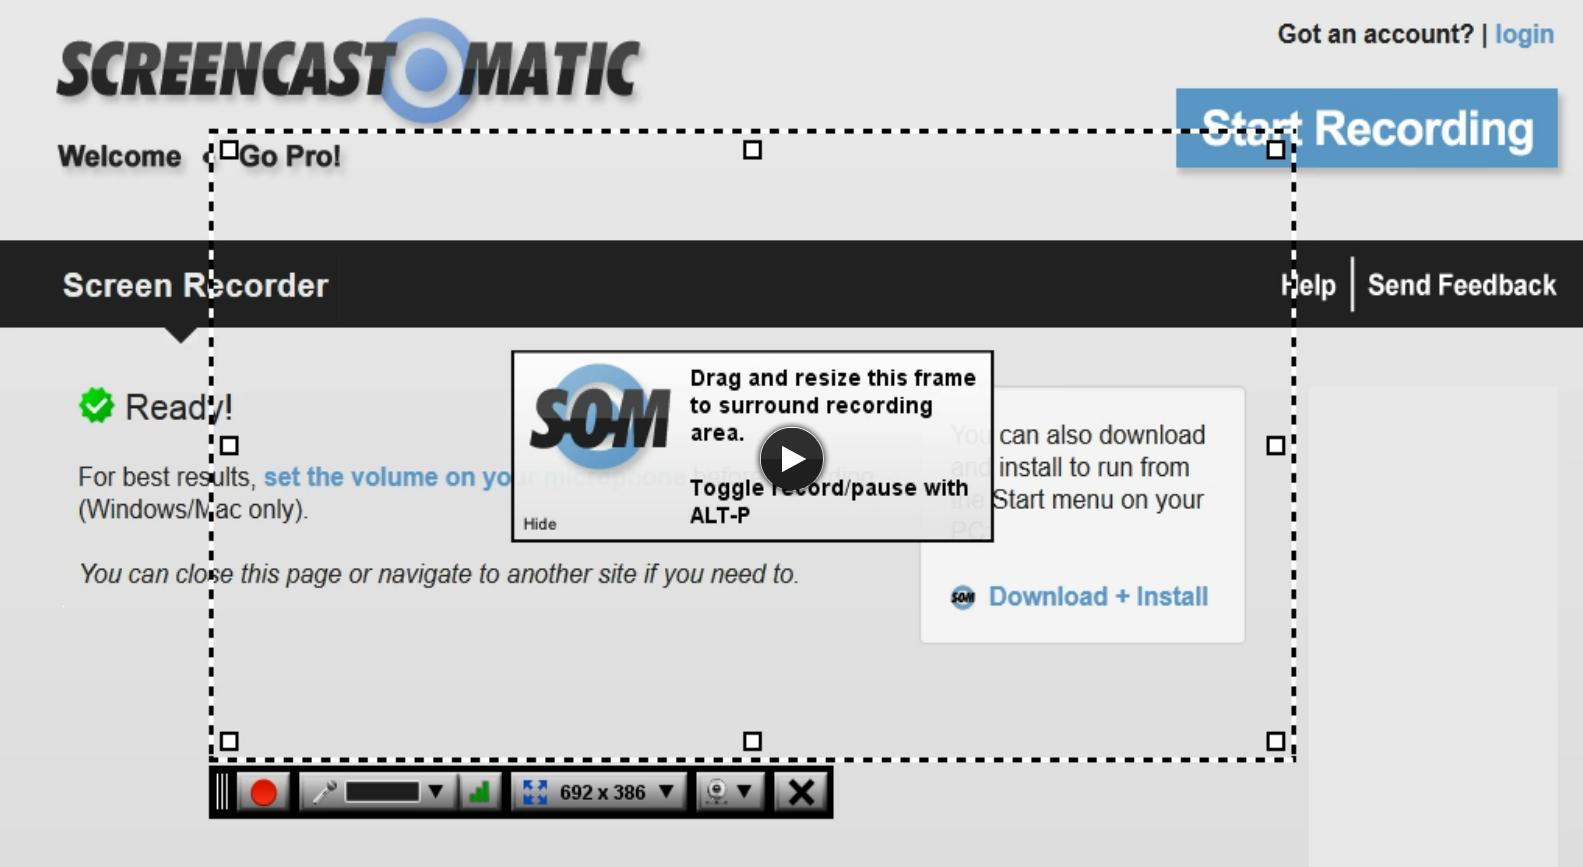 screencastomatic herramienta para videotutoriales